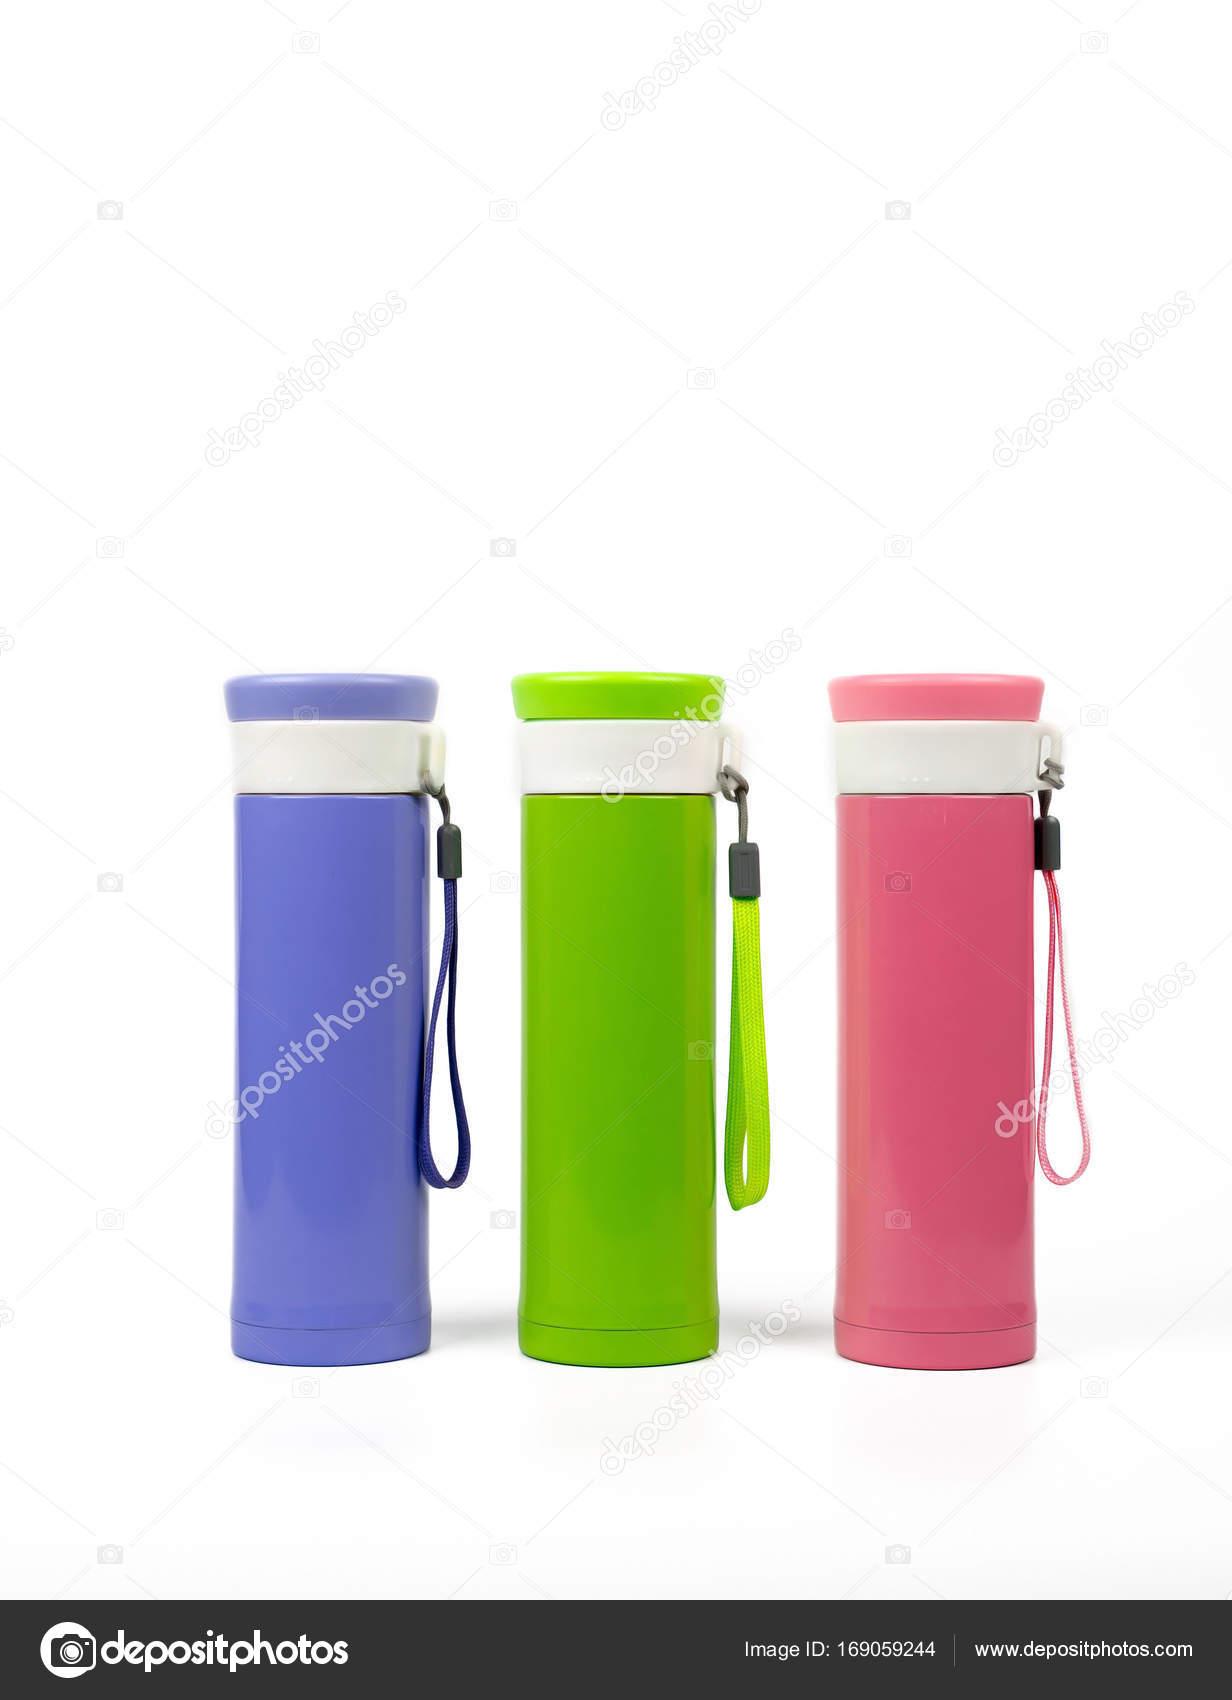 Púrpura, verdes y rosa botellas termo aisladas sobre fondo blanco ...